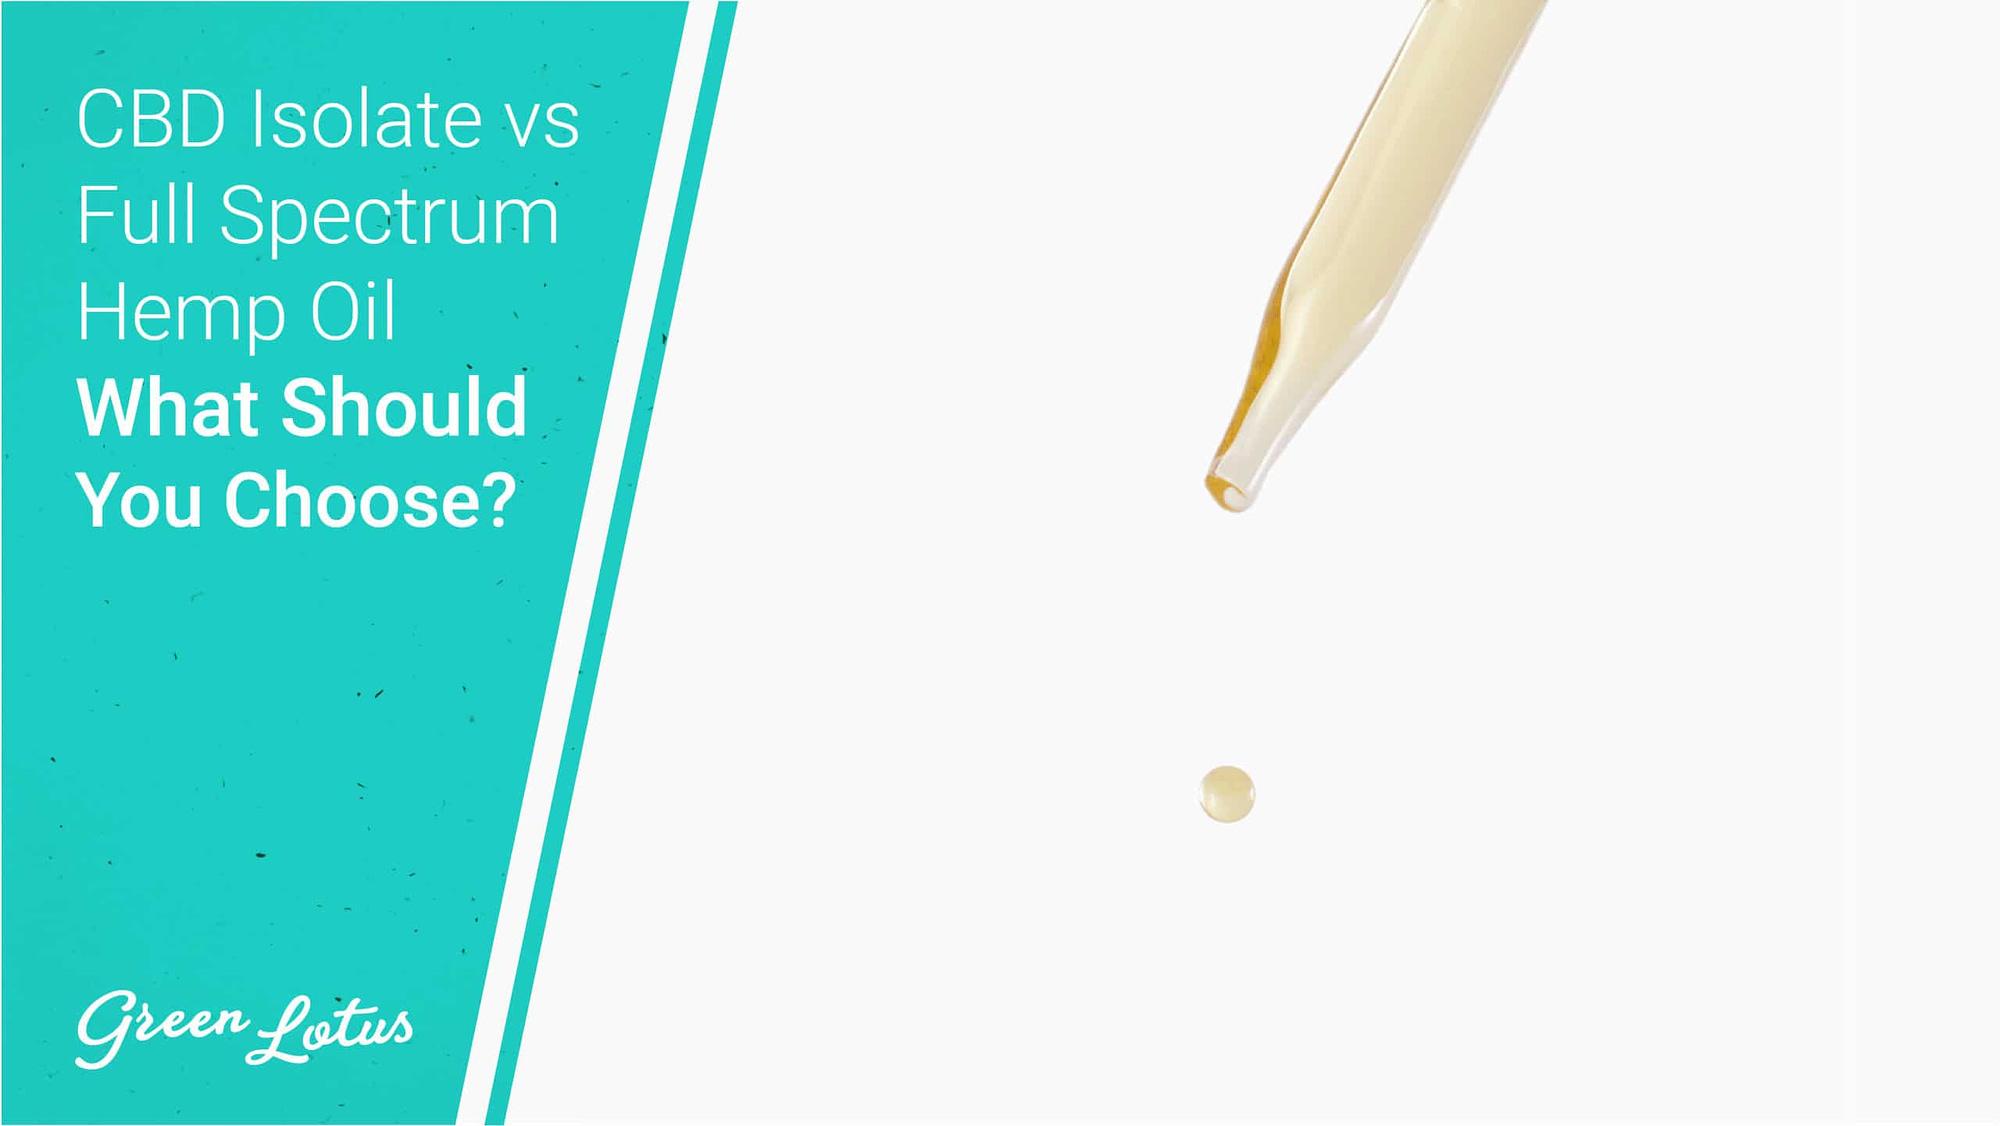 CBD Isolate vs Full Spectrum Hemp Oil - Which should you choose?